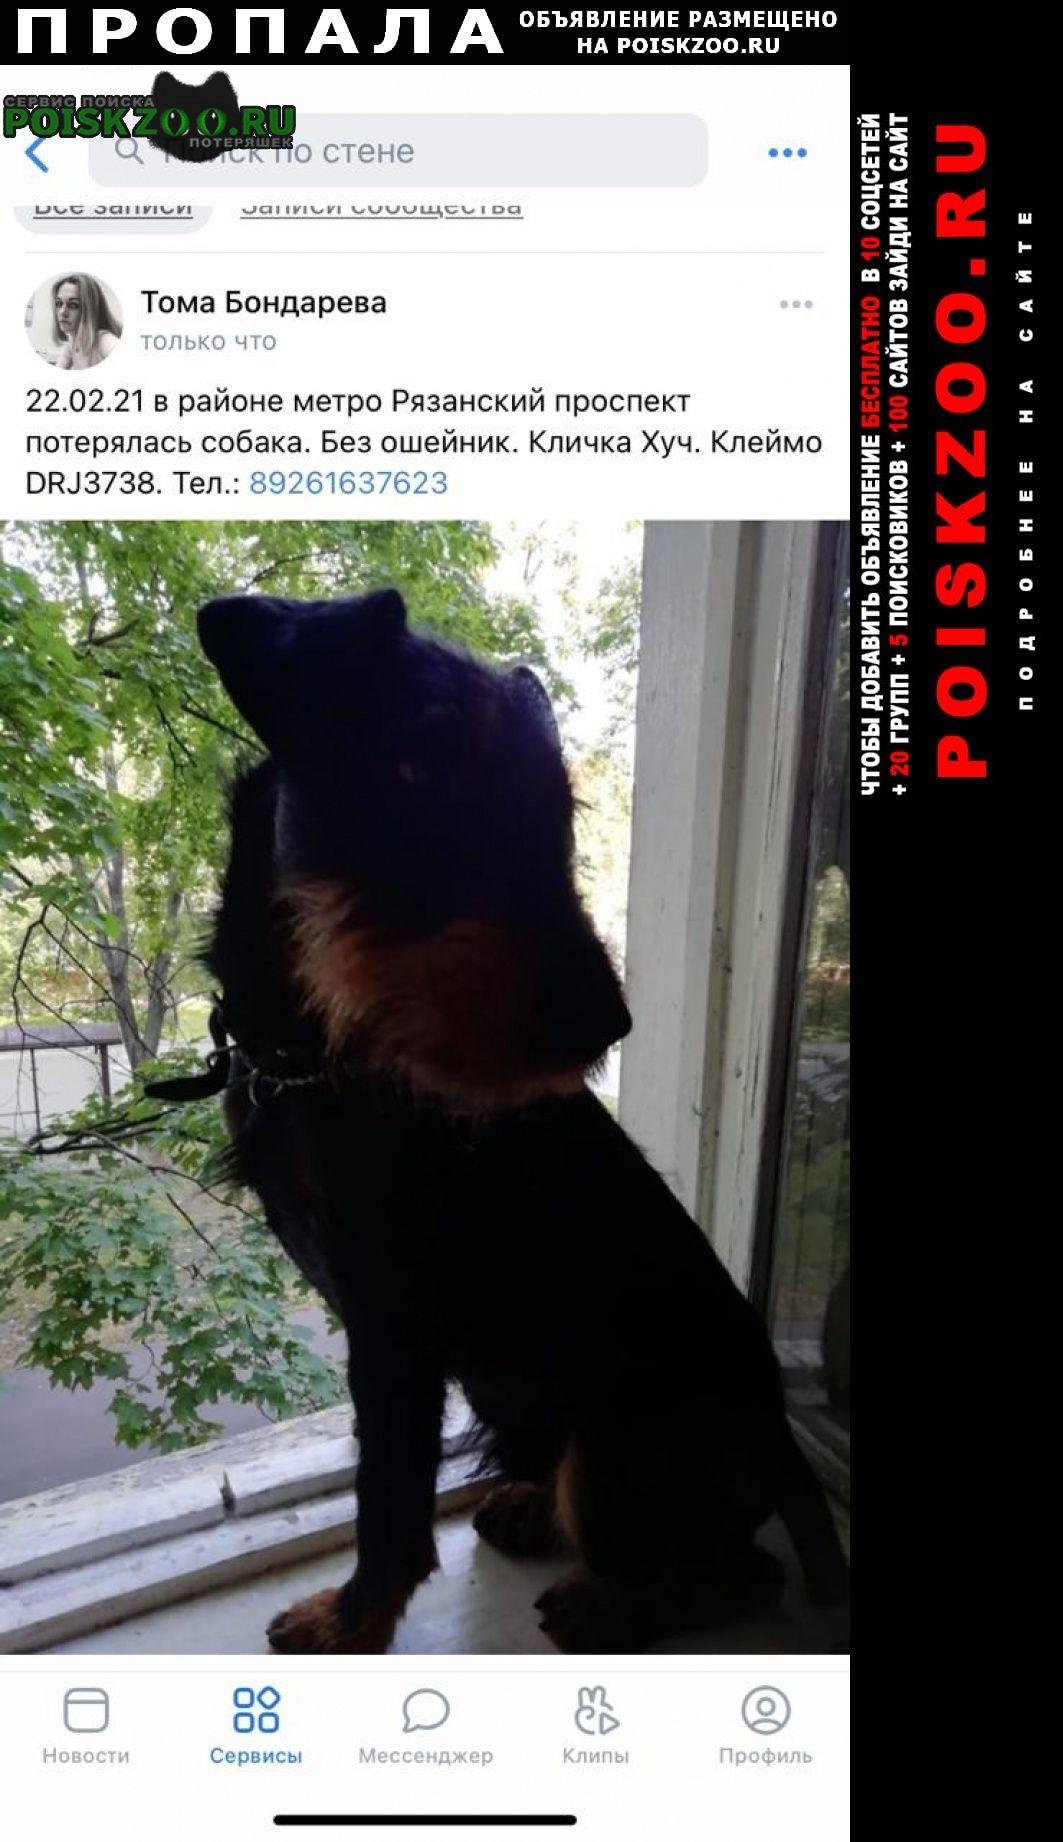 Пропала собака кобель сбежал. Москва